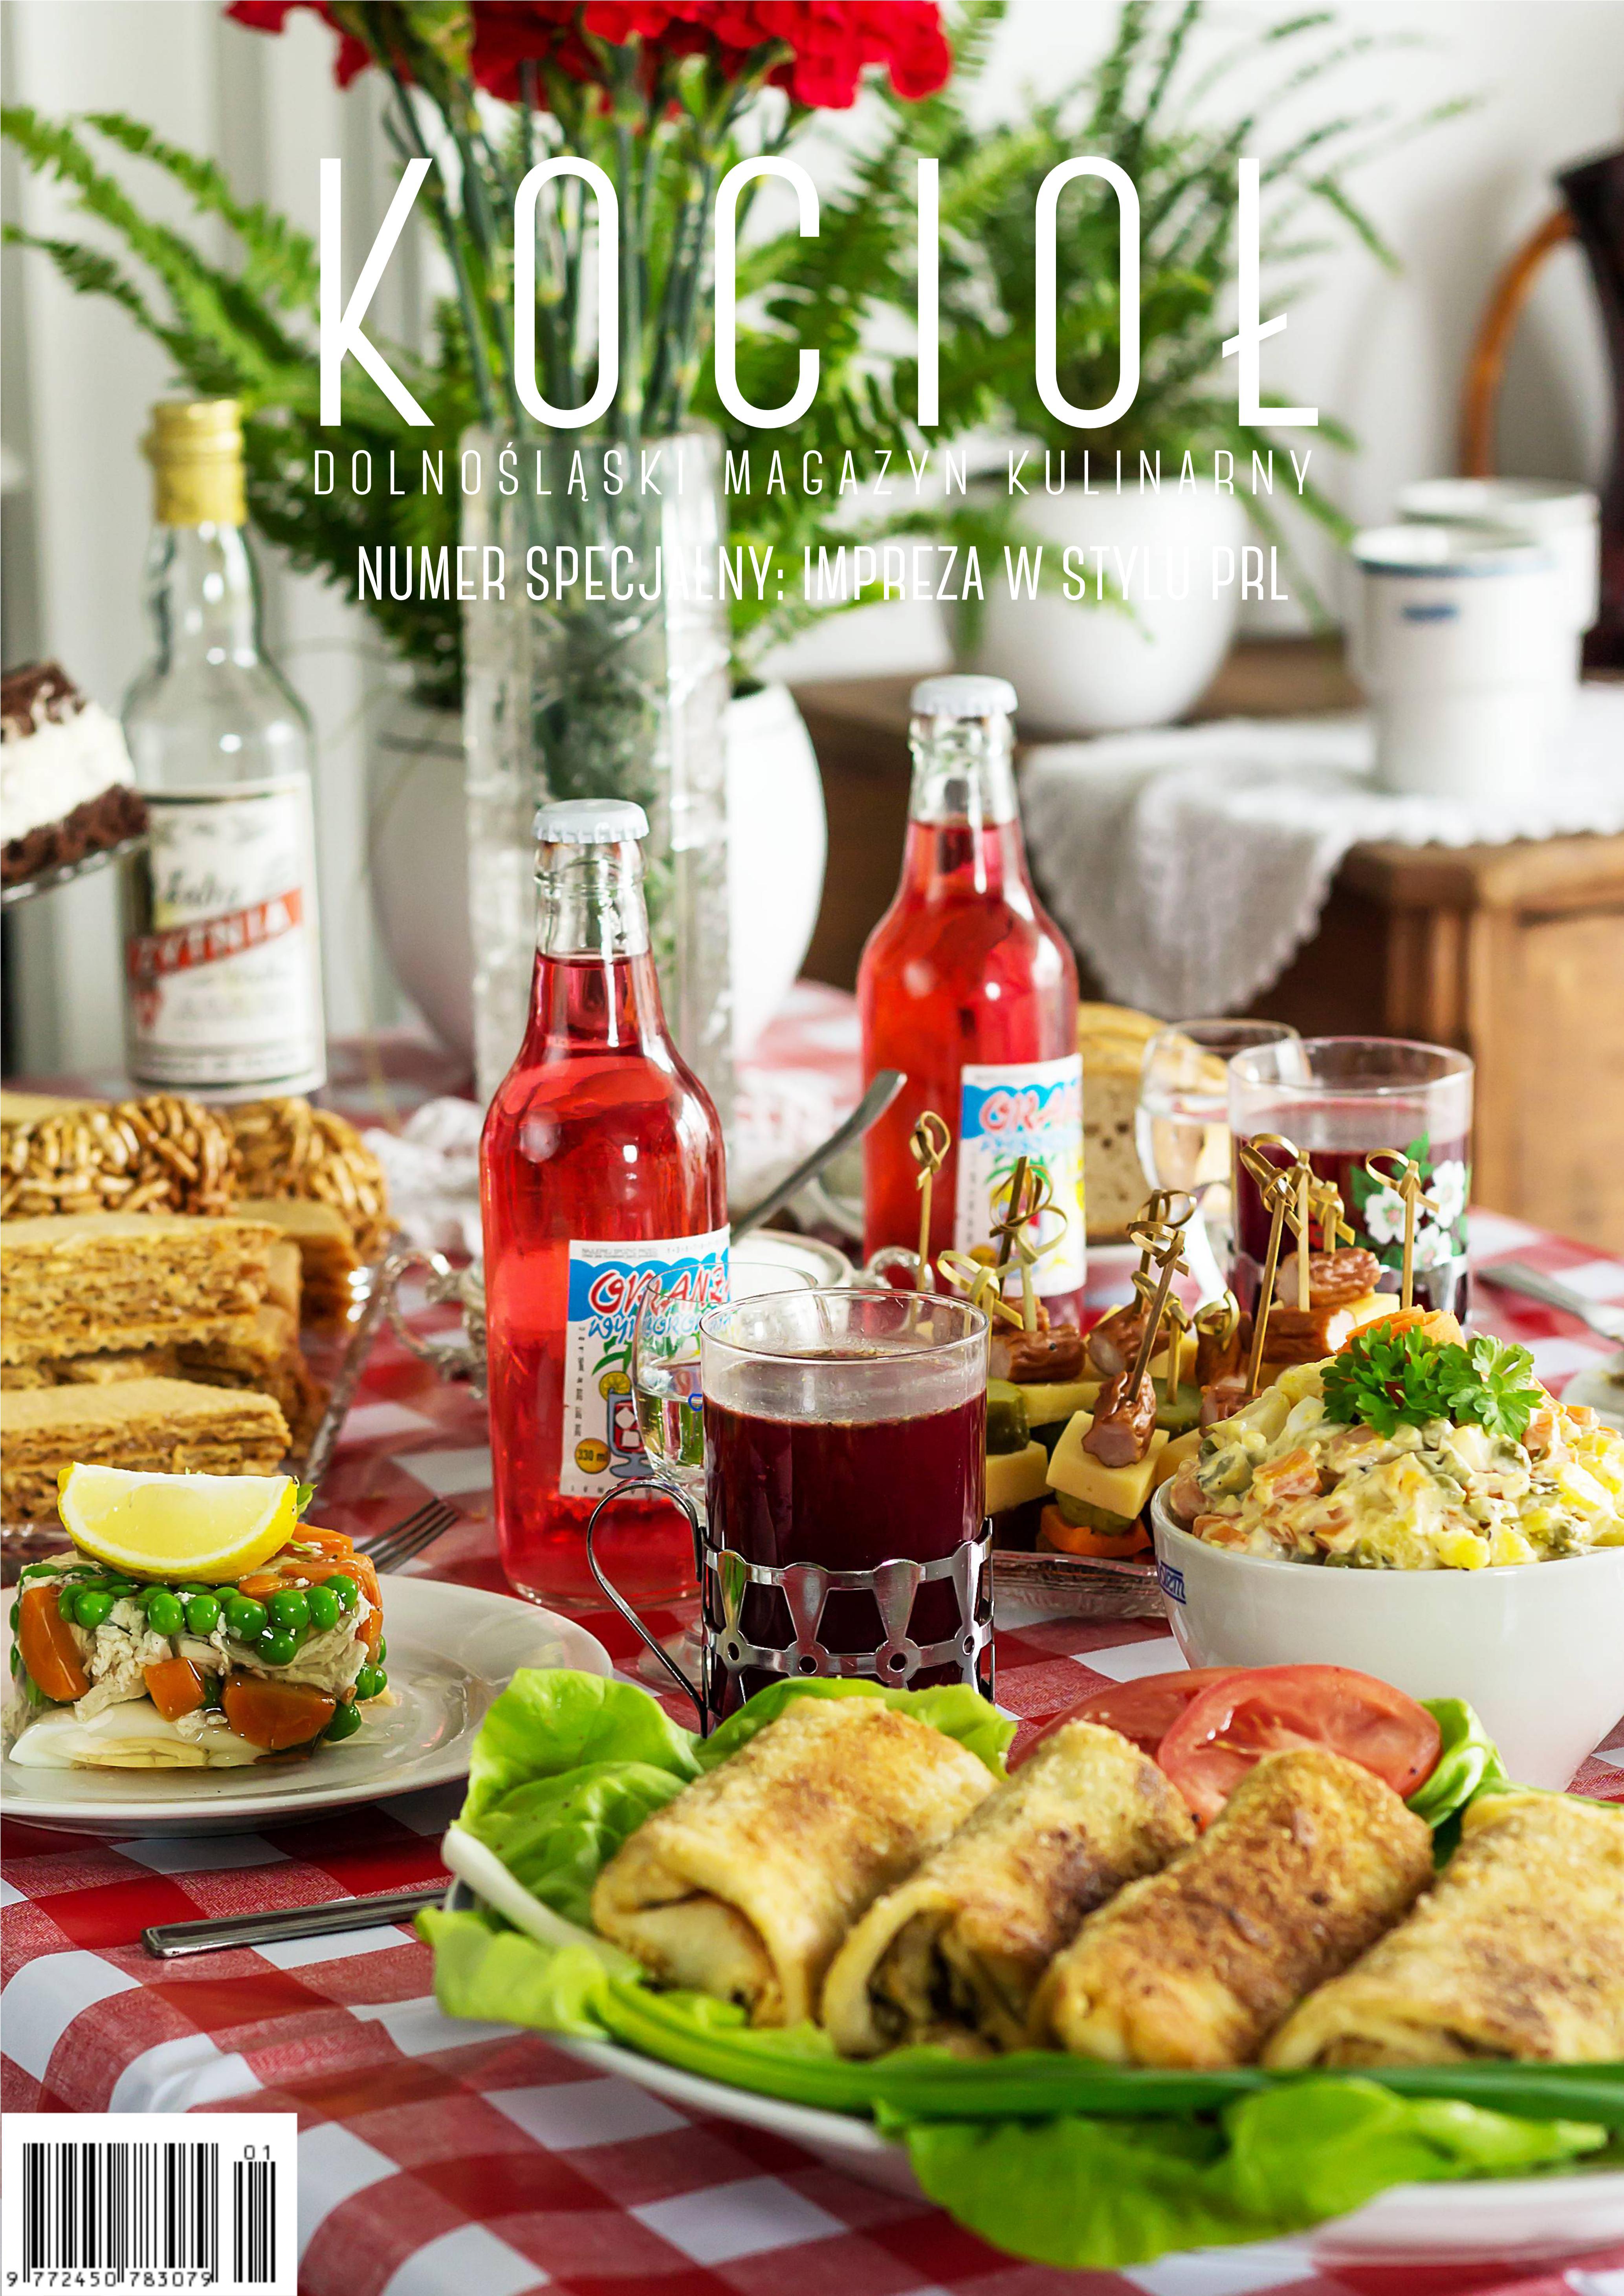 Dolnoslaski Magazyn Kulinarny Kociol Numer Specjalny Impreza W Stylu Prl